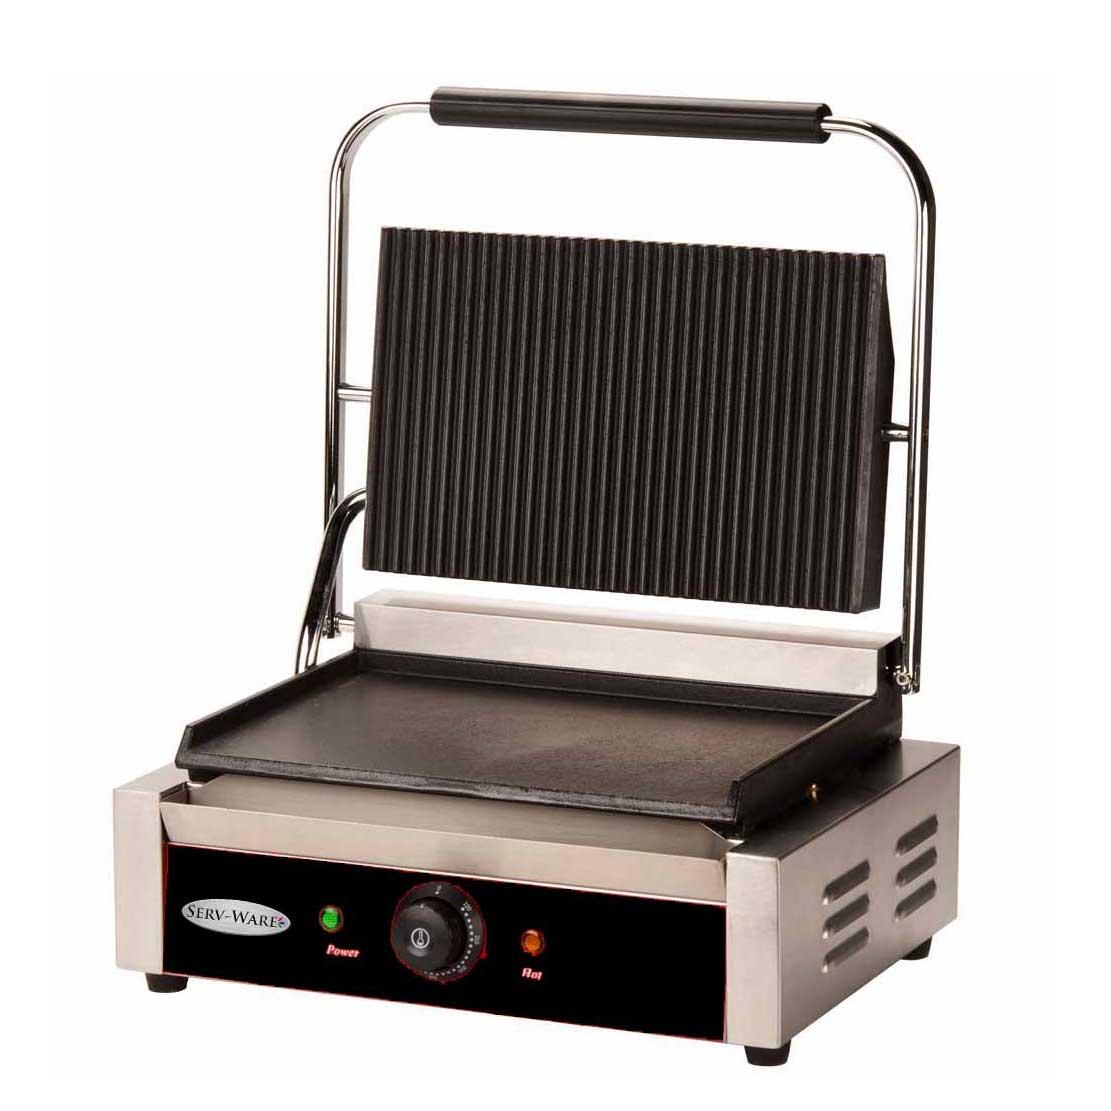 Serv-Ware EPG-100GF sandwich / panini grill